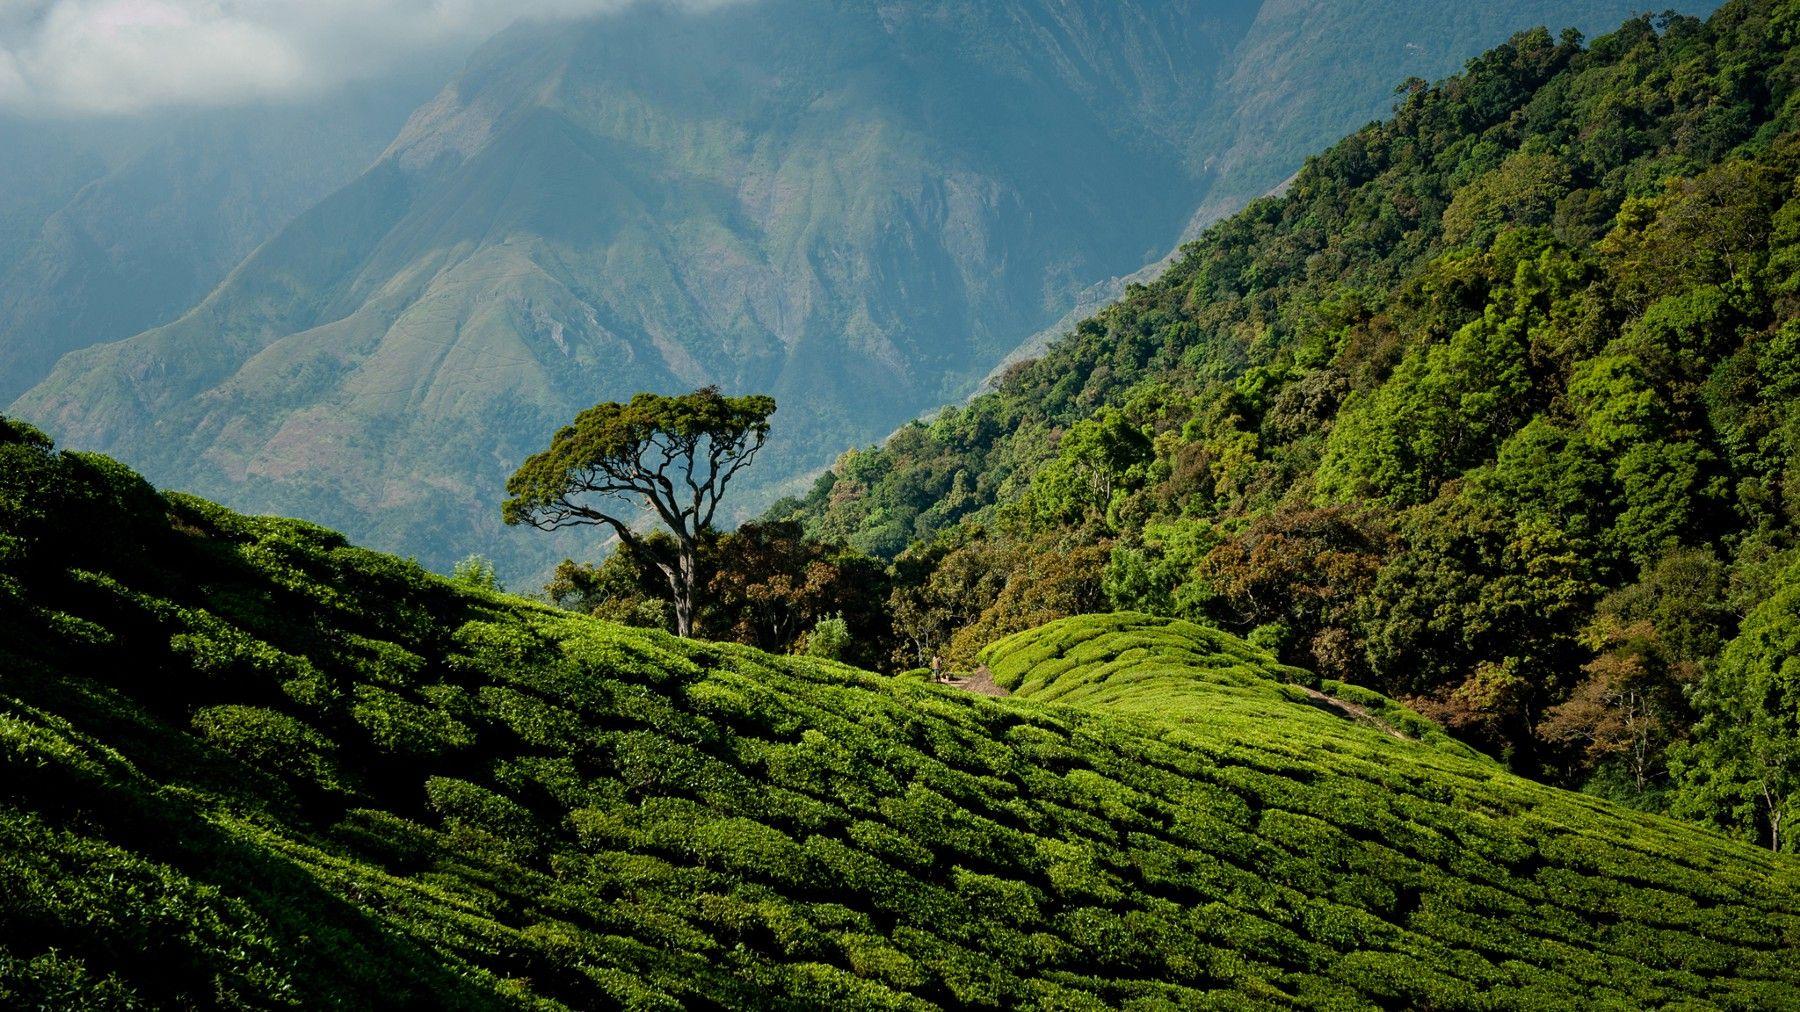 Tea plantations of Munnar, India in 2019 Amazon fire tv